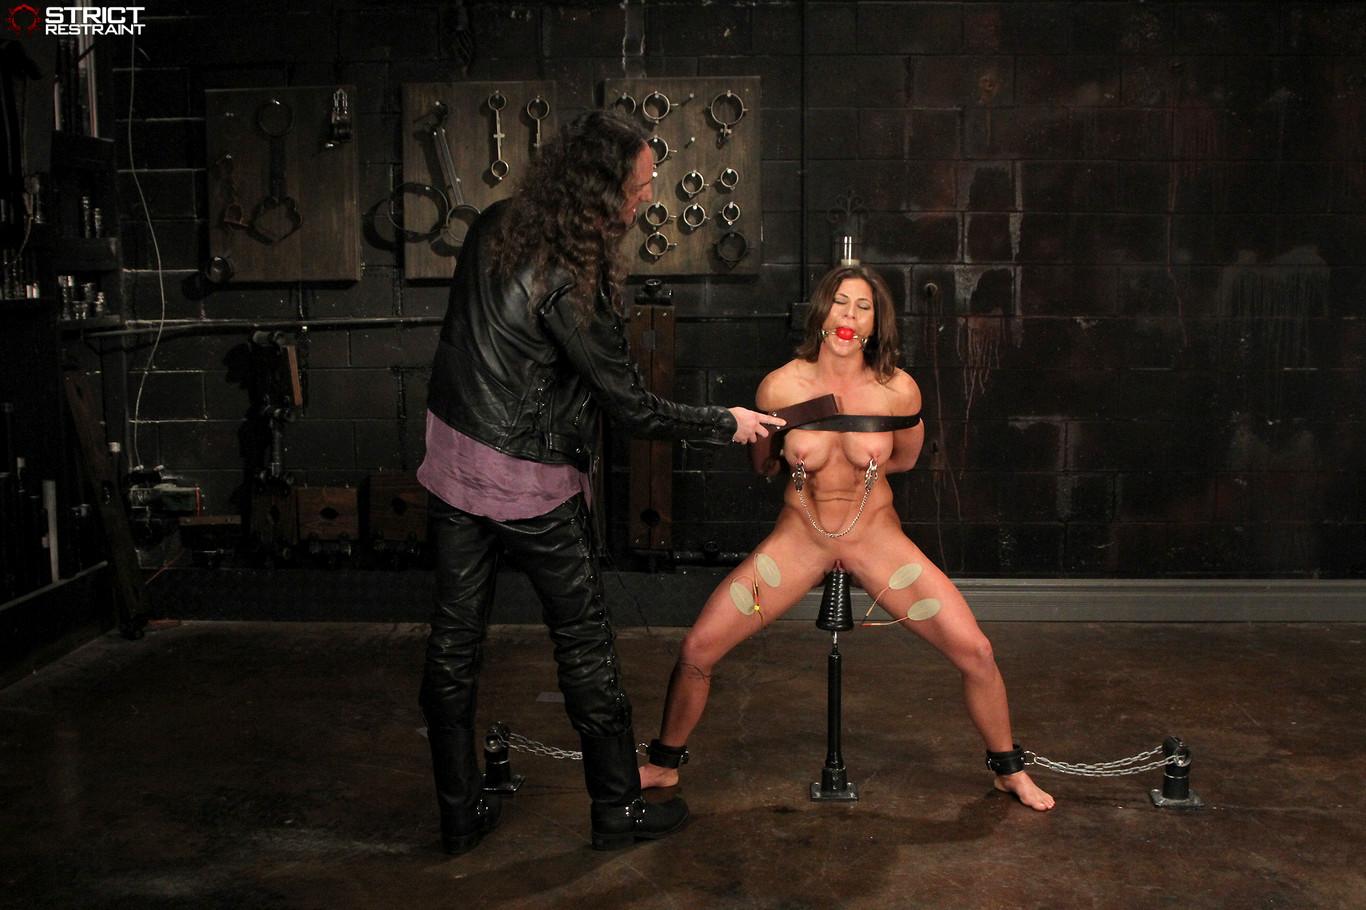 Babe Today Strict Restraint Ariel X Natural Bdsm Sex -2684